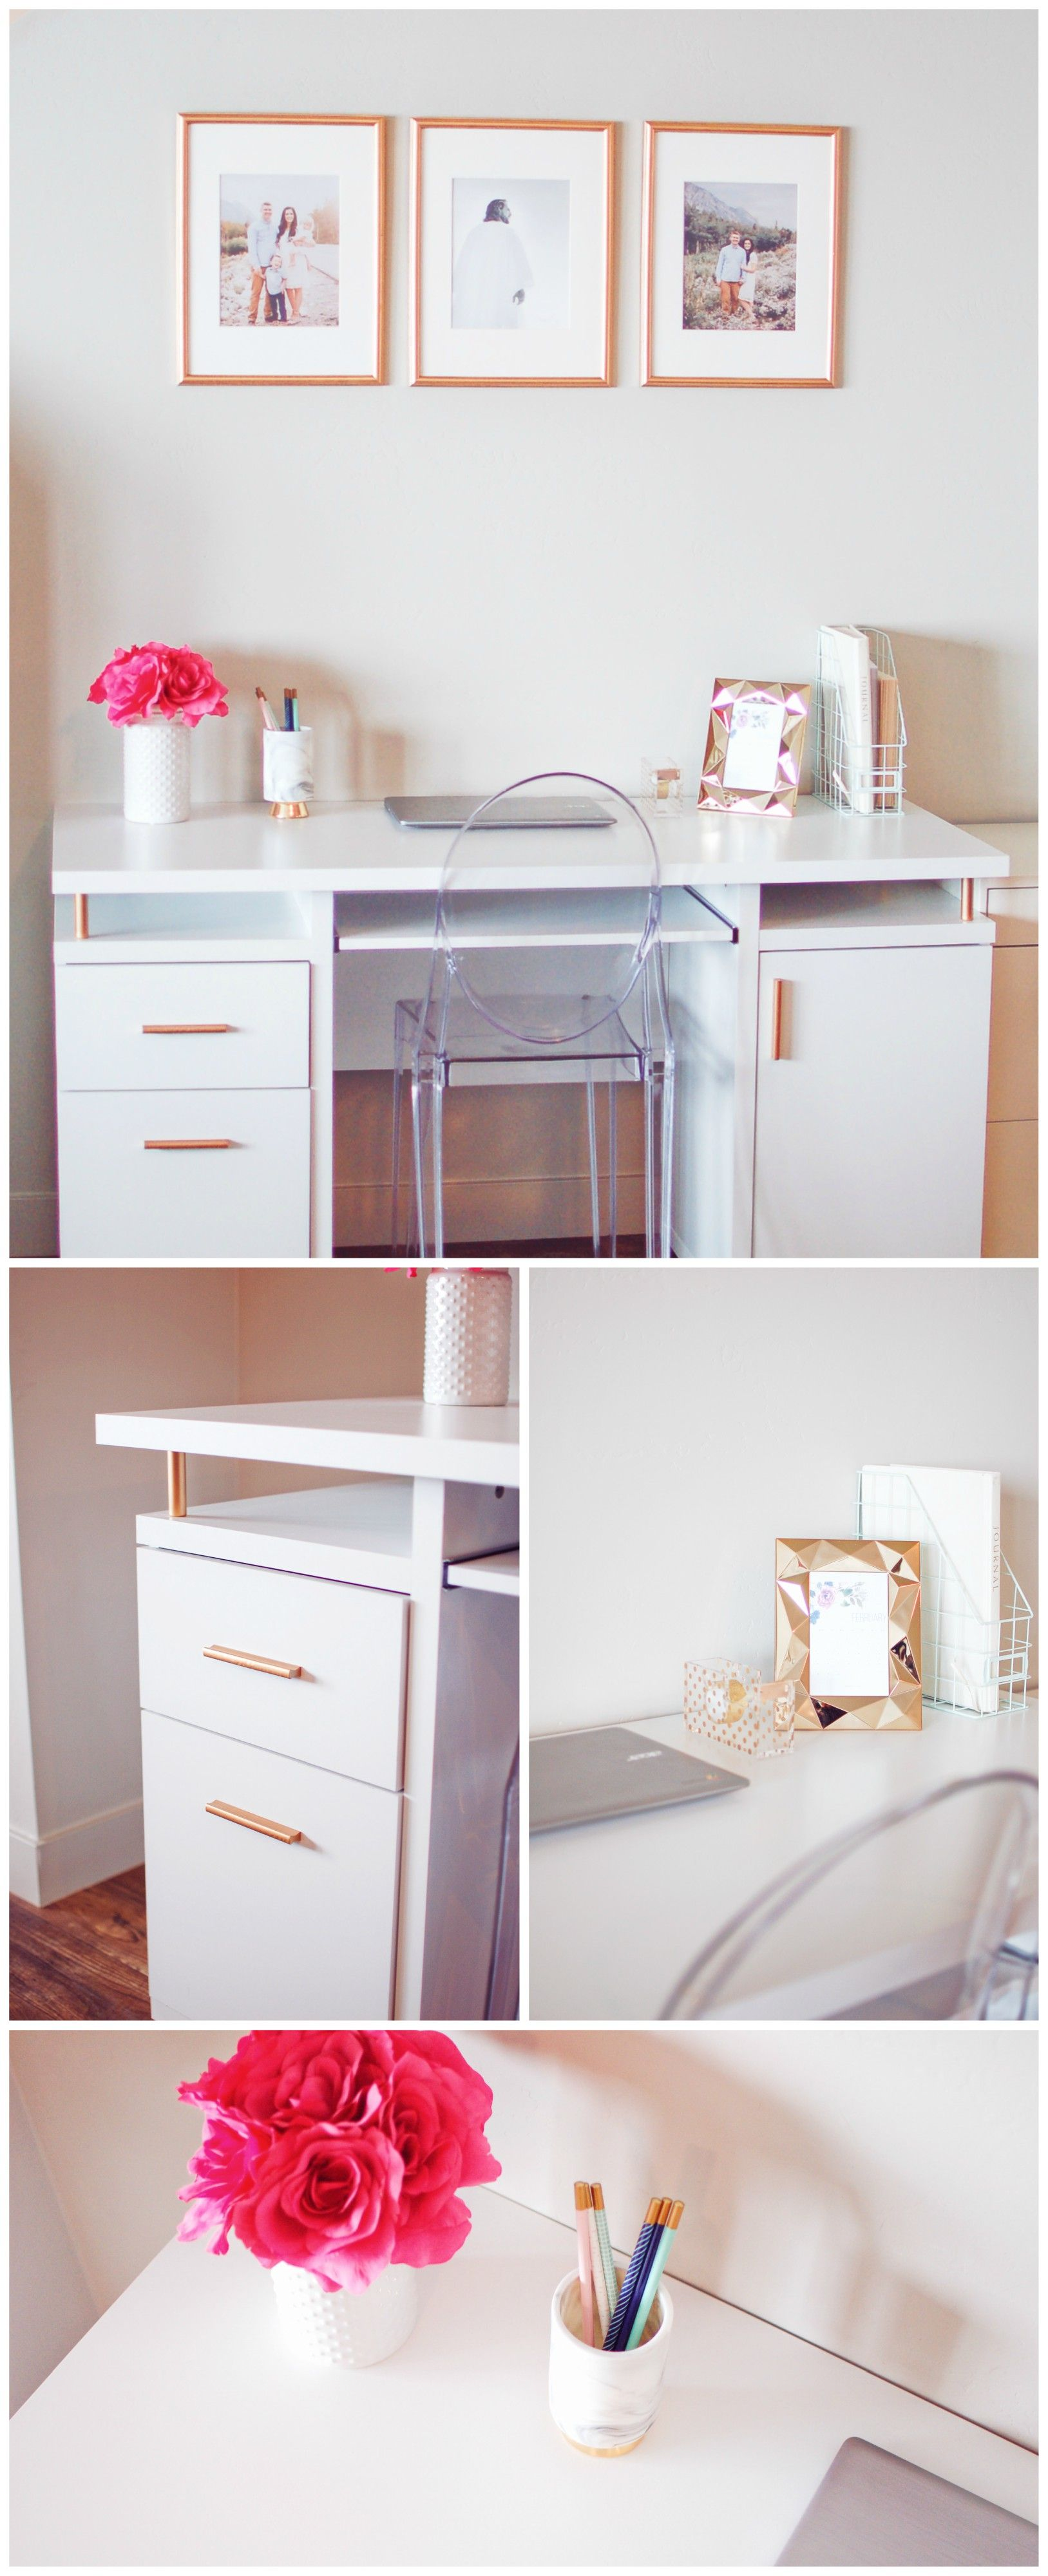 diy home desk interior images ideas glamorous space design various elegant office decor designers idea desks